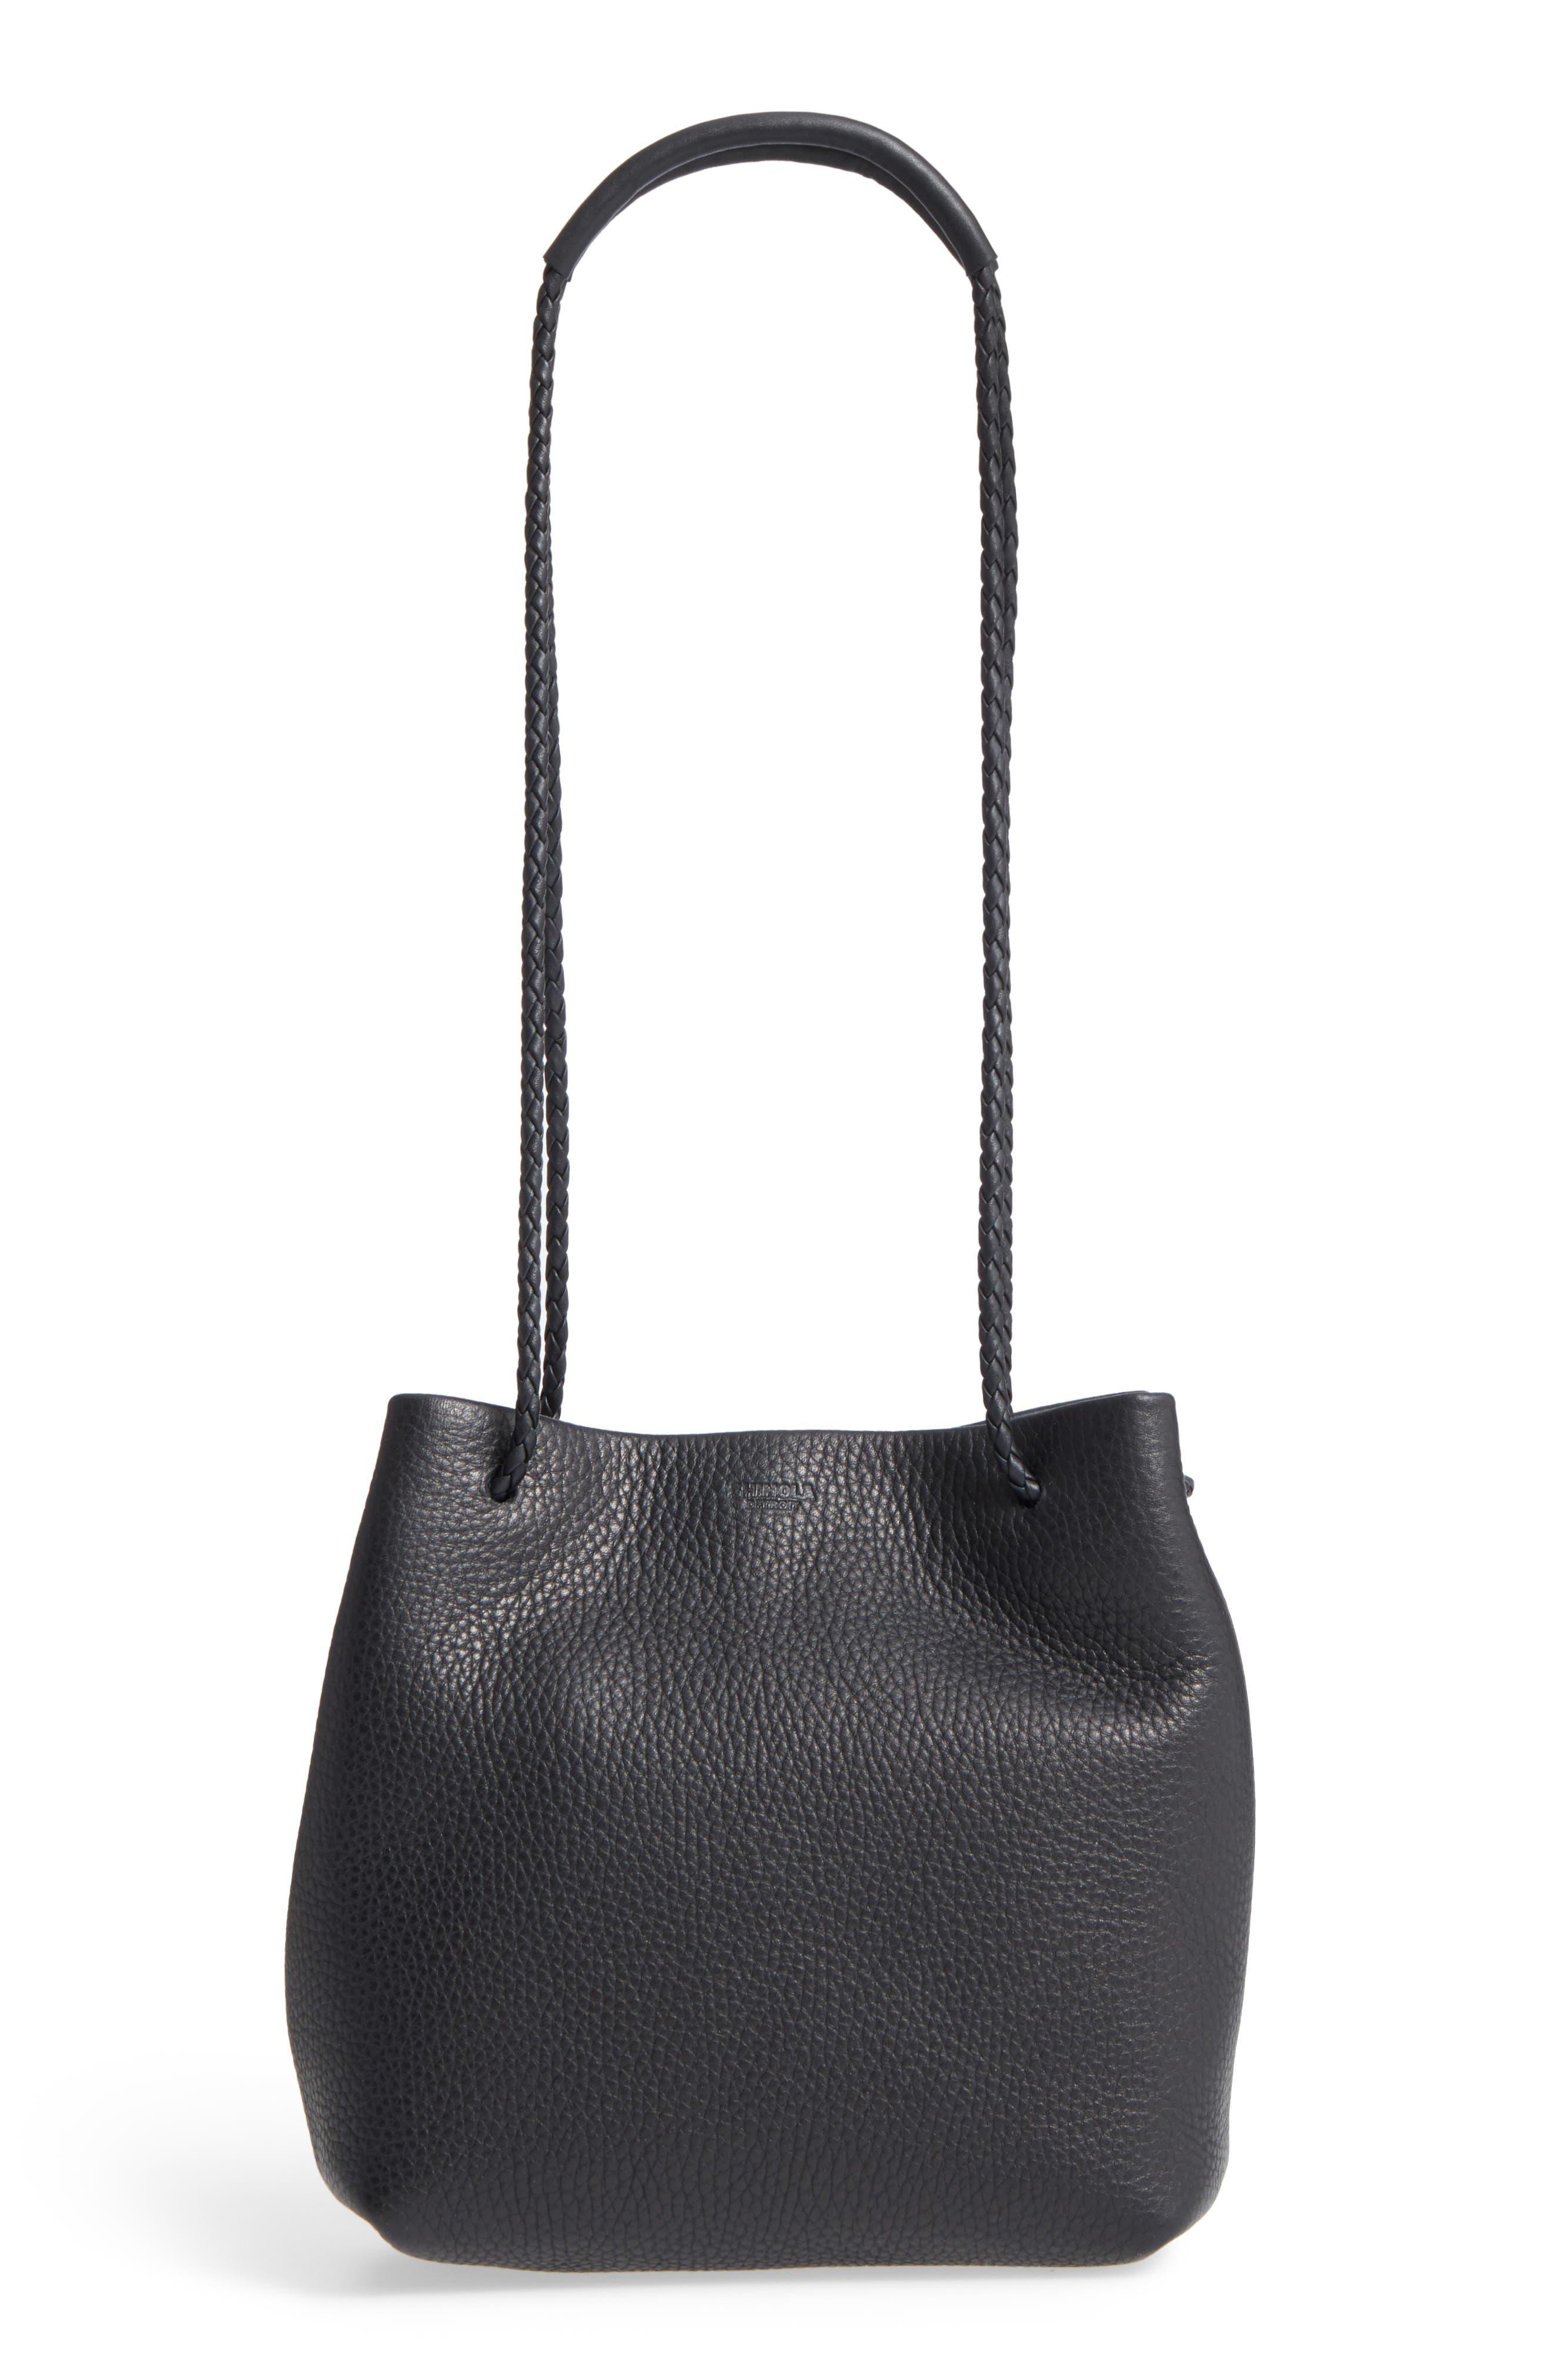 Shinola Mini Nappa Leather Drawstring Strap Bag